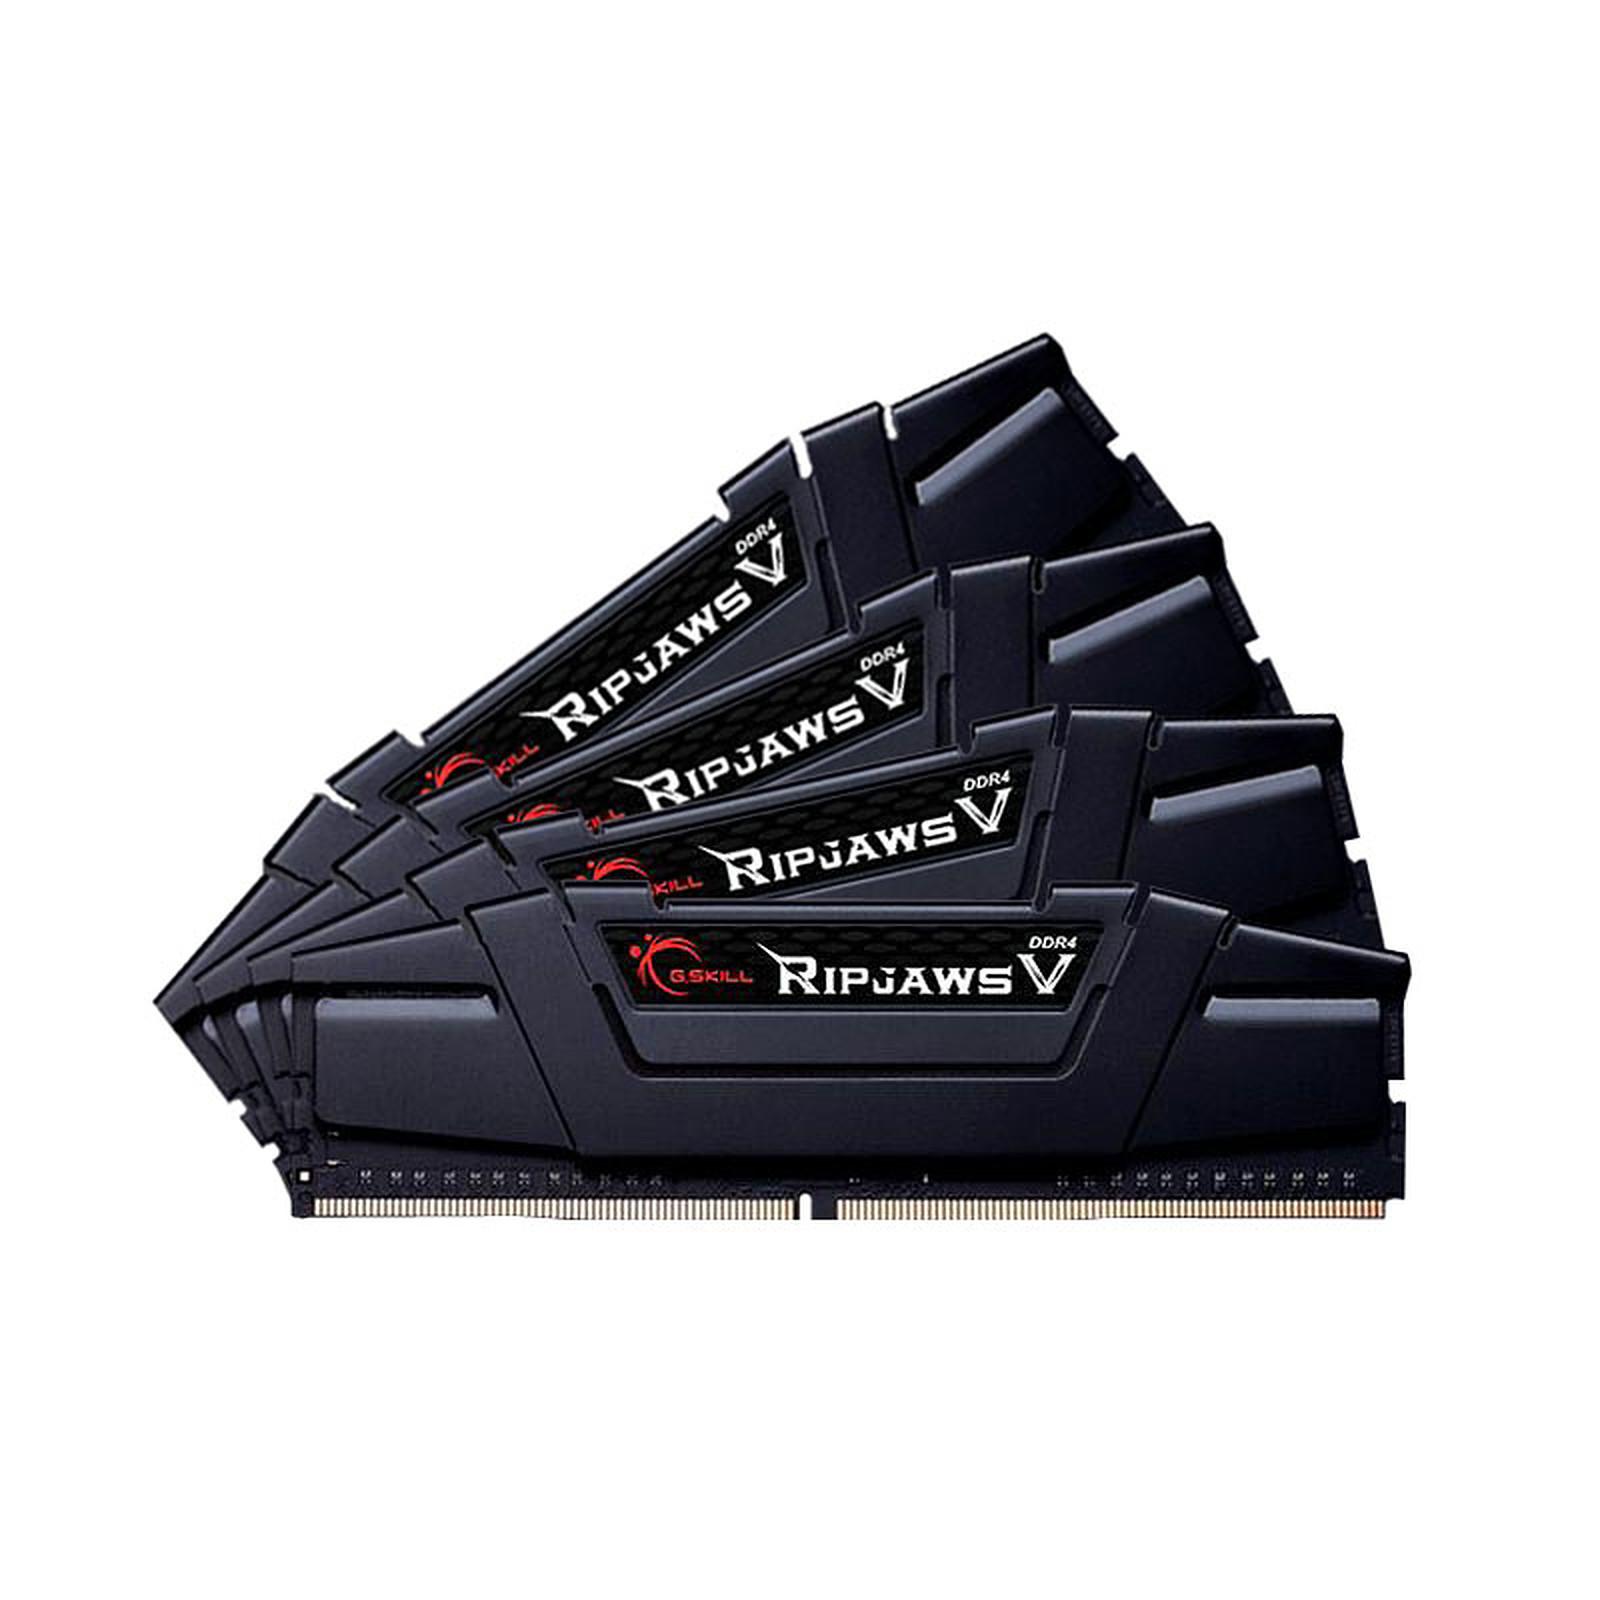 G.Skill RipJaws 5 Series Noir 32 Go (4x 8 Go) DDR4 3200 MHz CL16